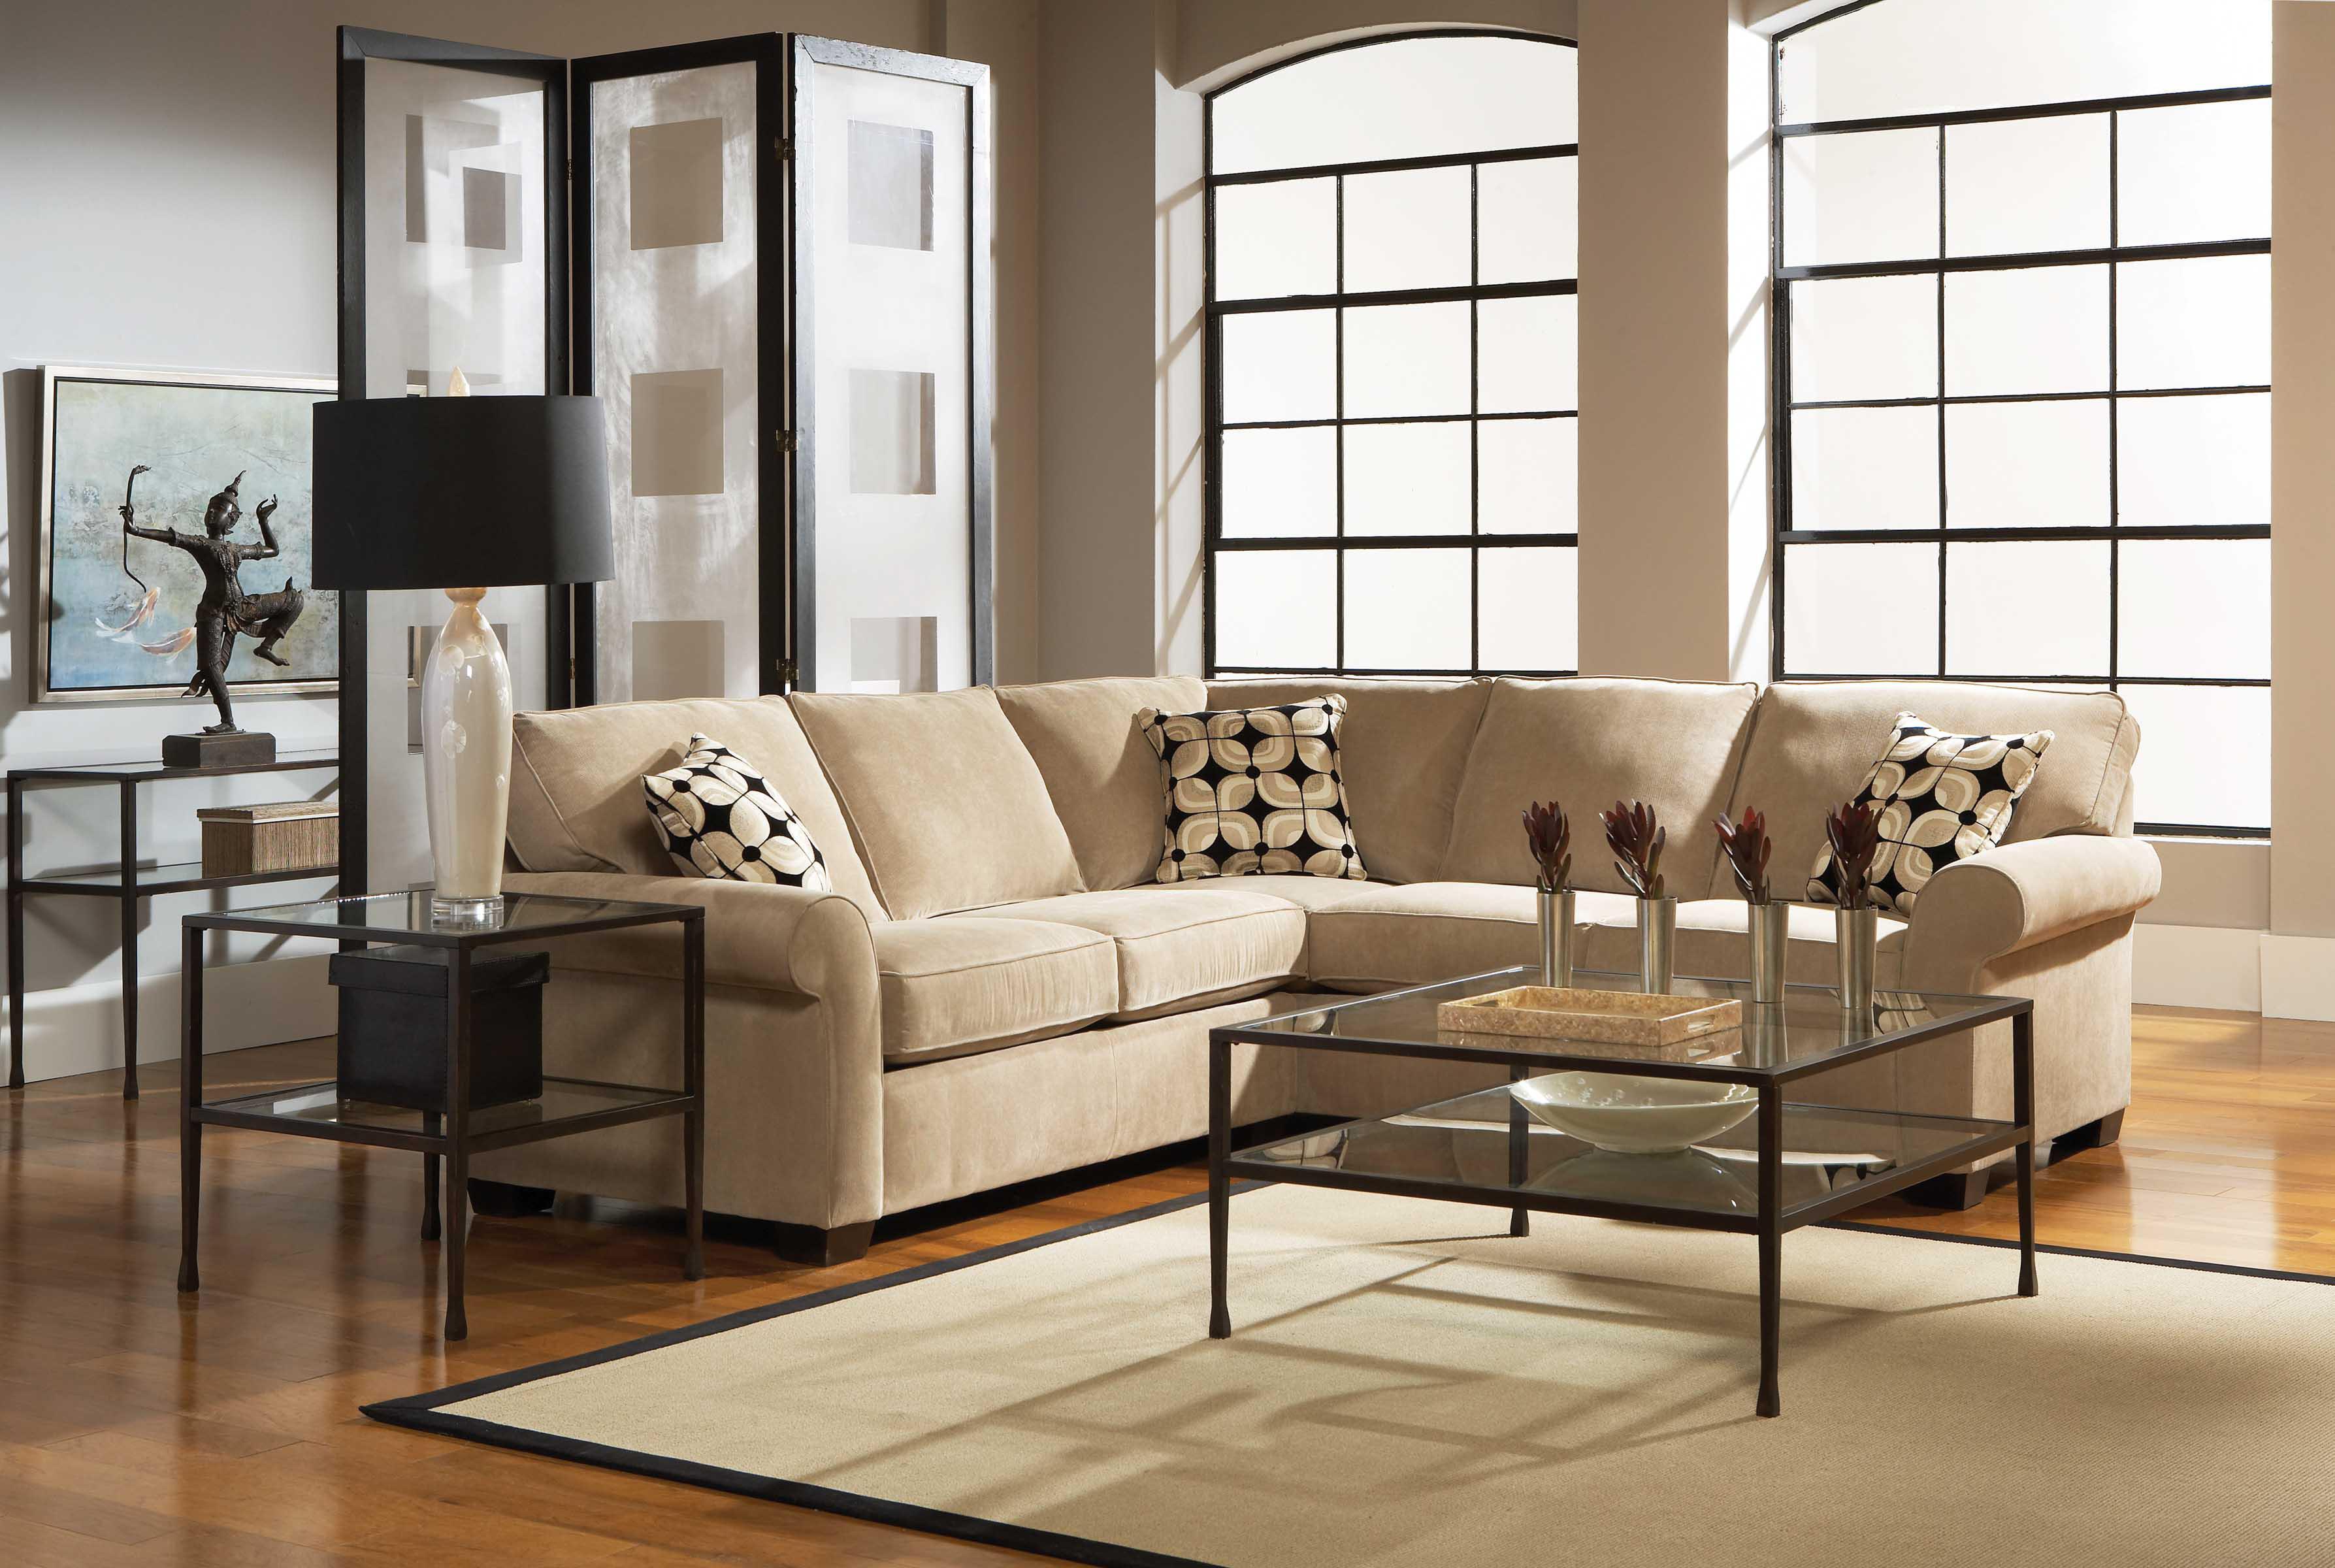 Furniture stores in Tucson AZ